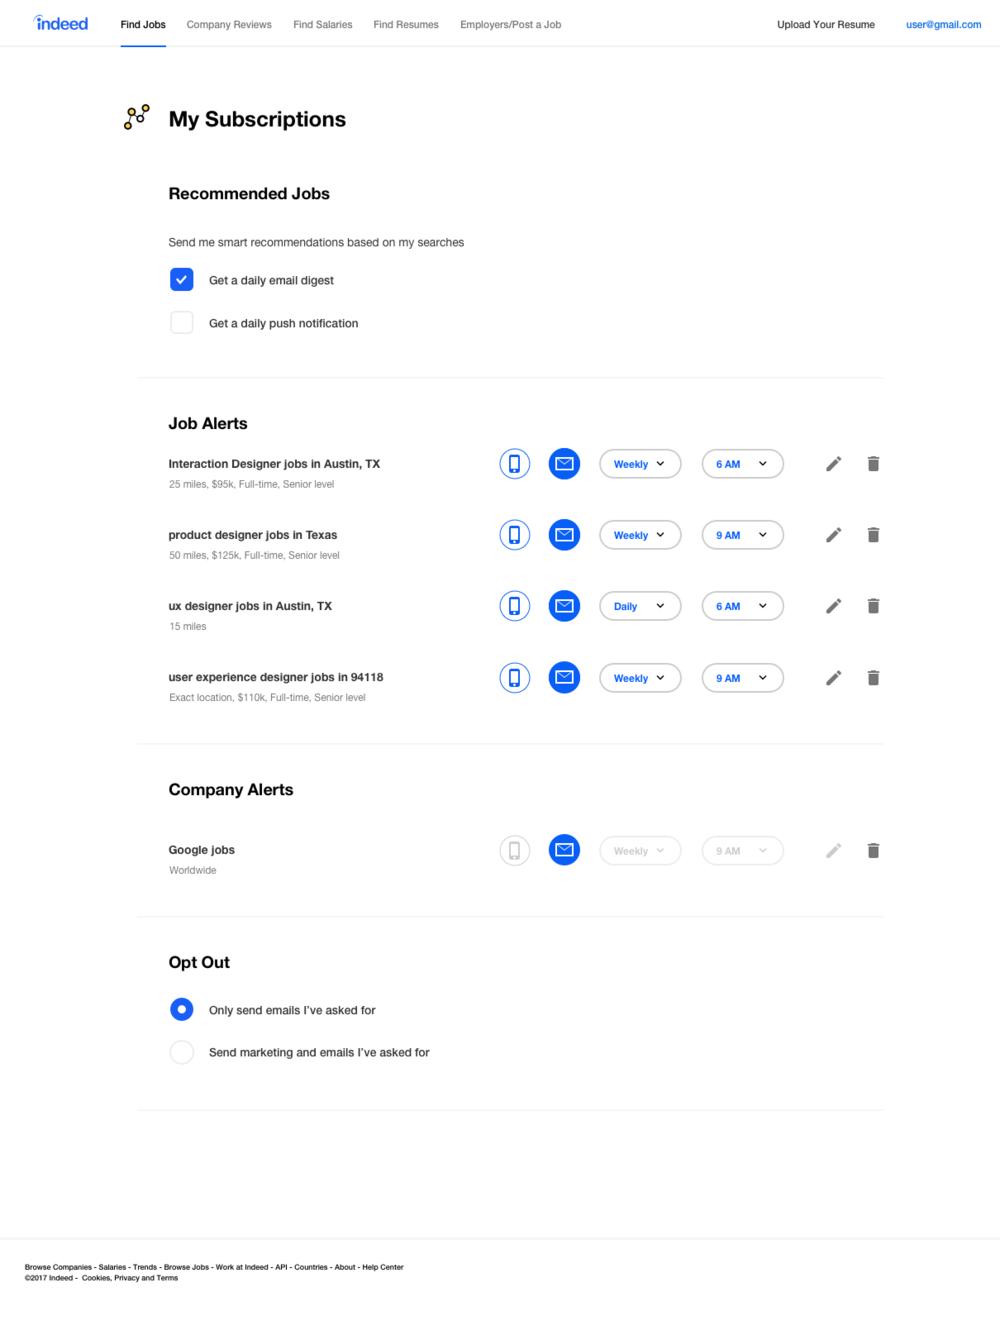 Subway Web App 2.0 V2 Dropdown Updated.png